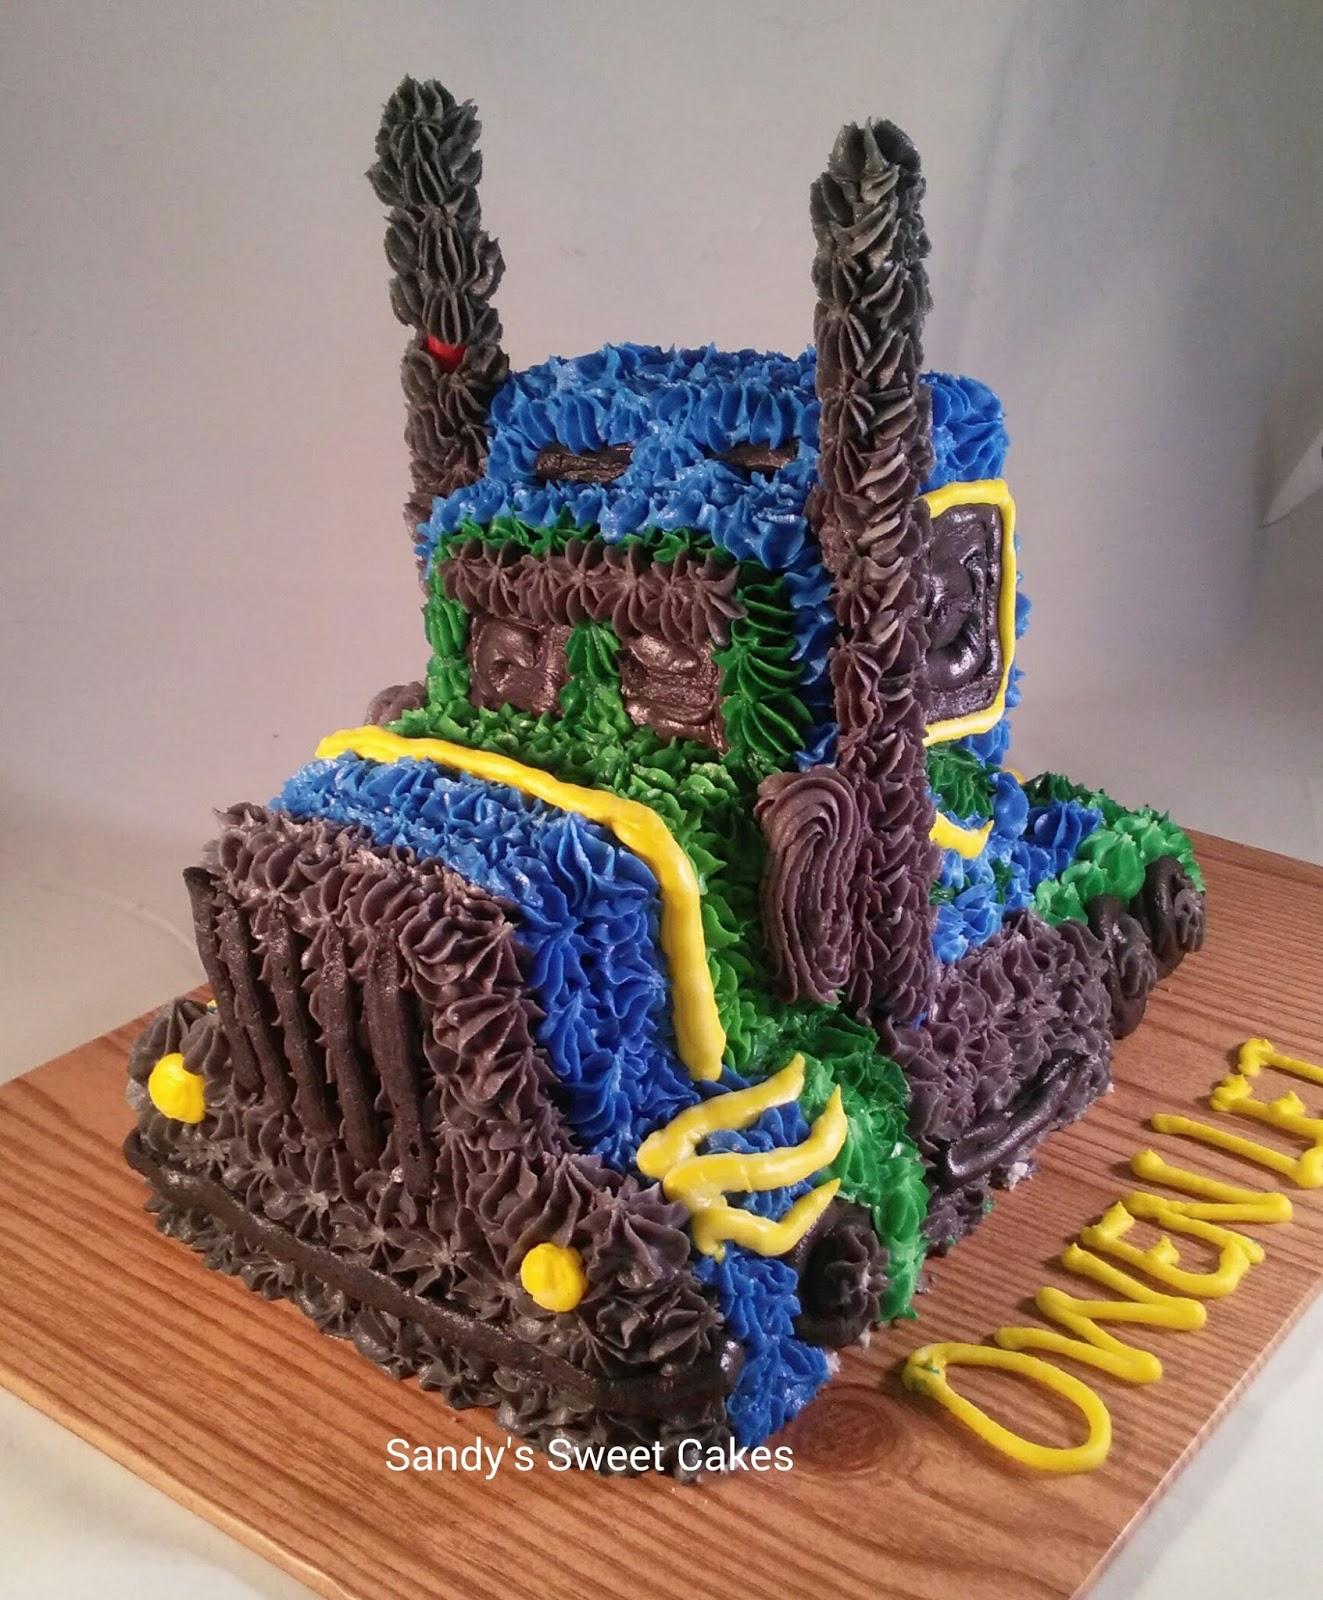 Sandys Sweet Cakes 3D 18 wheeler tractor trailer truck cake